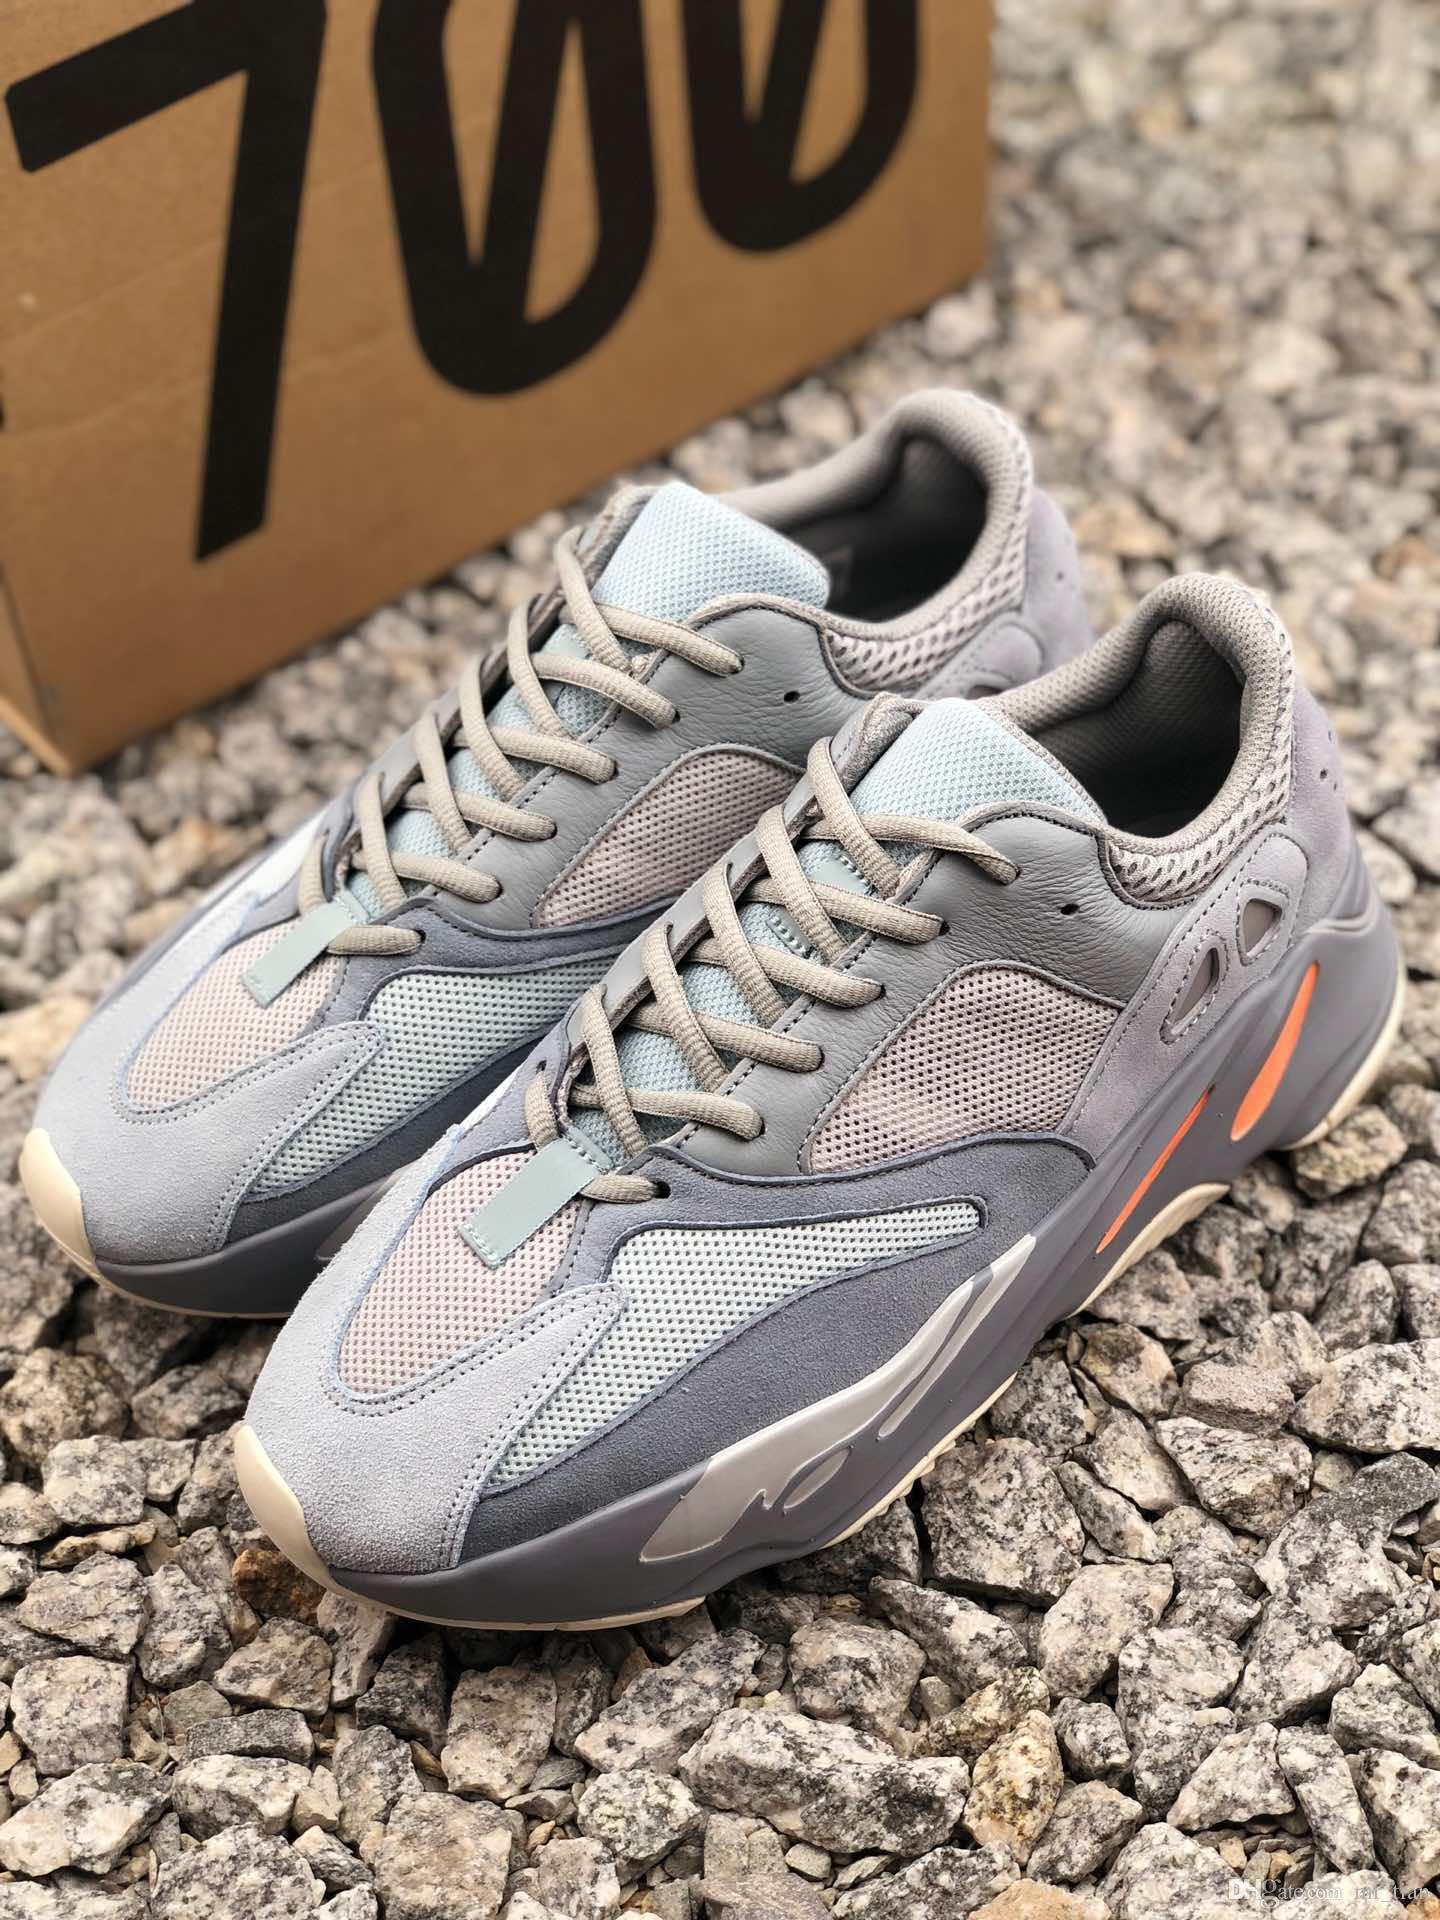 new concept 2d935 e7363 Scarpe Da Walking Adidas Yeezy 700 V2 Boost Running Shoes 2019 Nuove Scarpe  Da Corsa Da Uomo E Da Donna 700 V2 Salt Modello Sneakers Moda B75571 Euro  36 46 ...